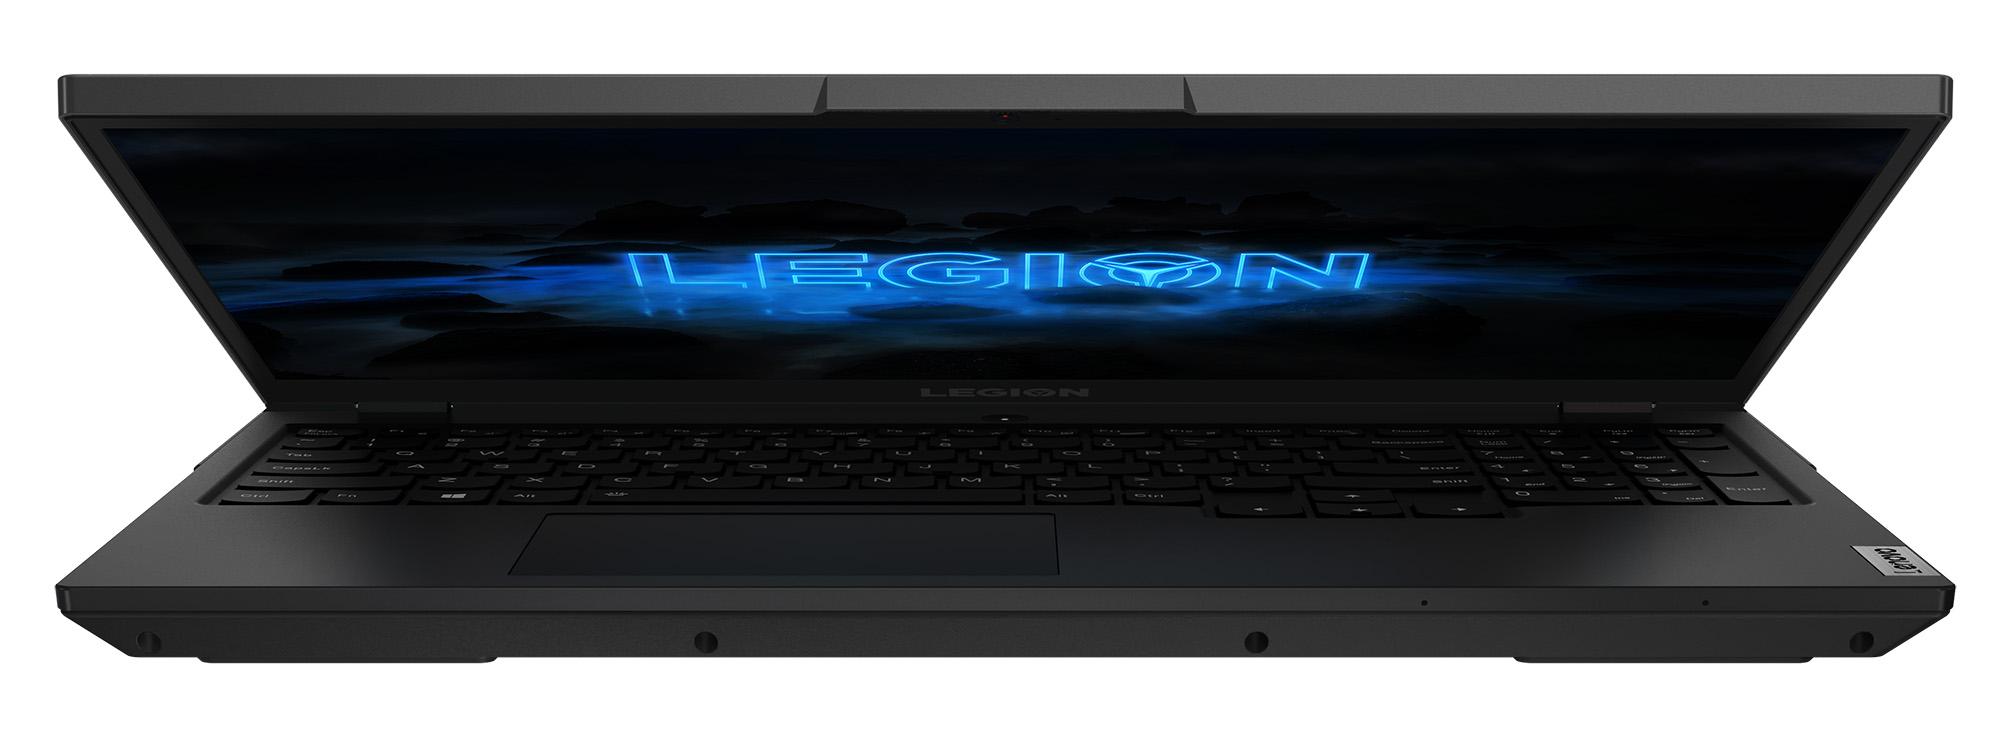 Фото  Ноутбук Lenovo Legion 5i 15IMH05H Phantom Black (81Y600CYRE)